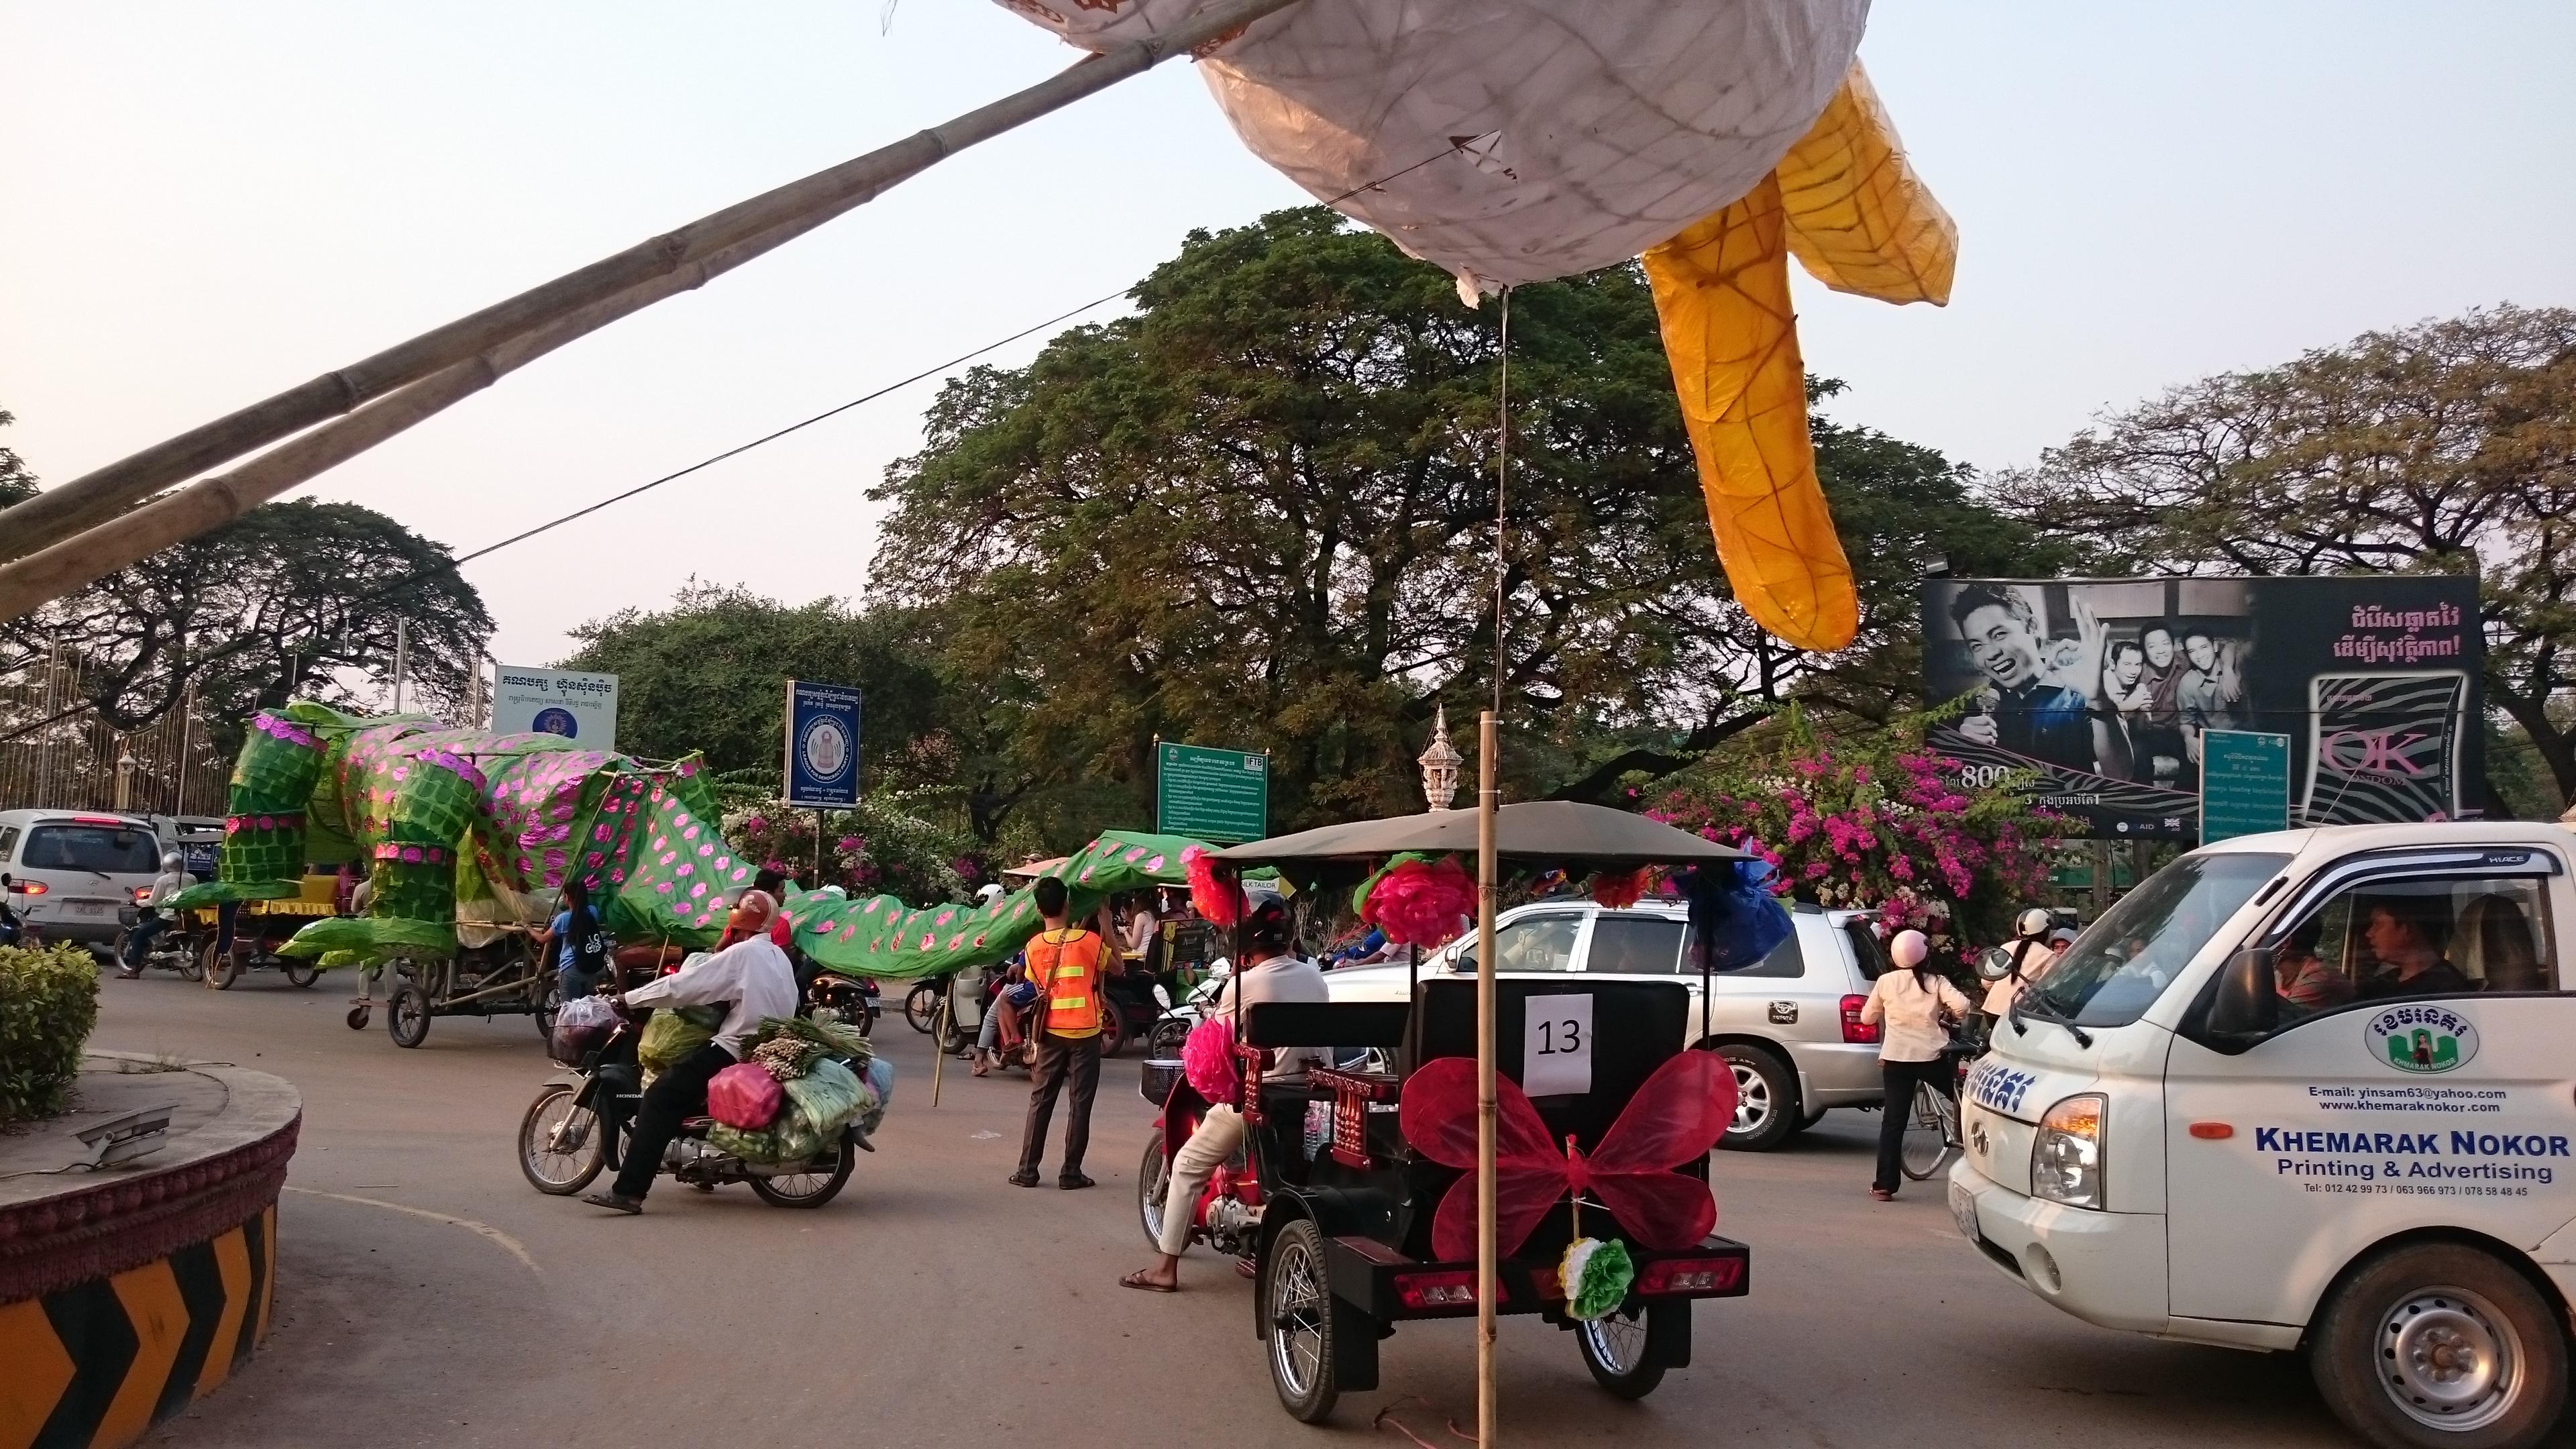 Puppet traffic jam